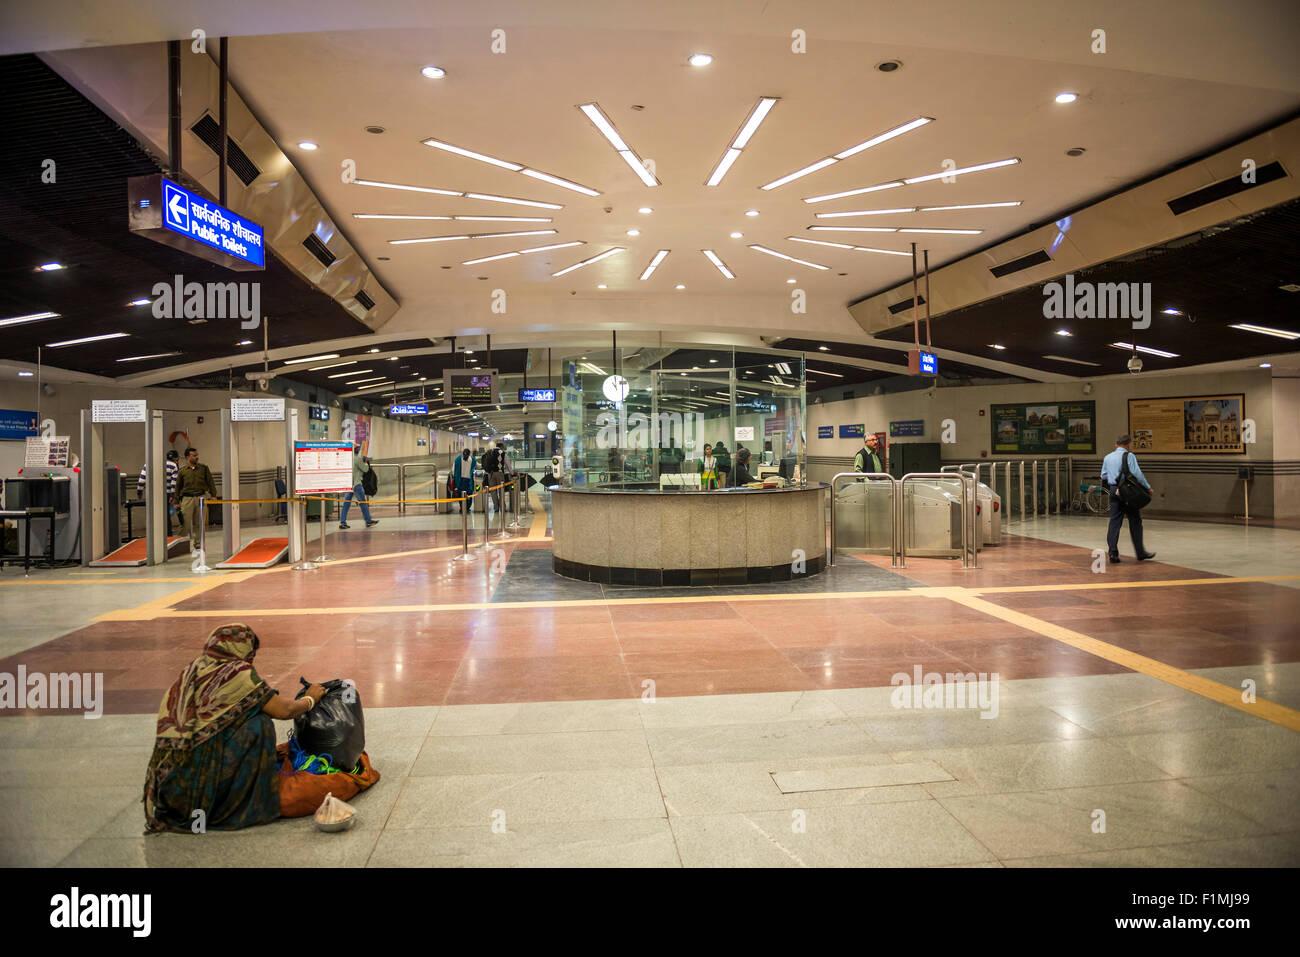 One of Delhi's new Metro Rail Stations in New Delhi, India - Stock Image